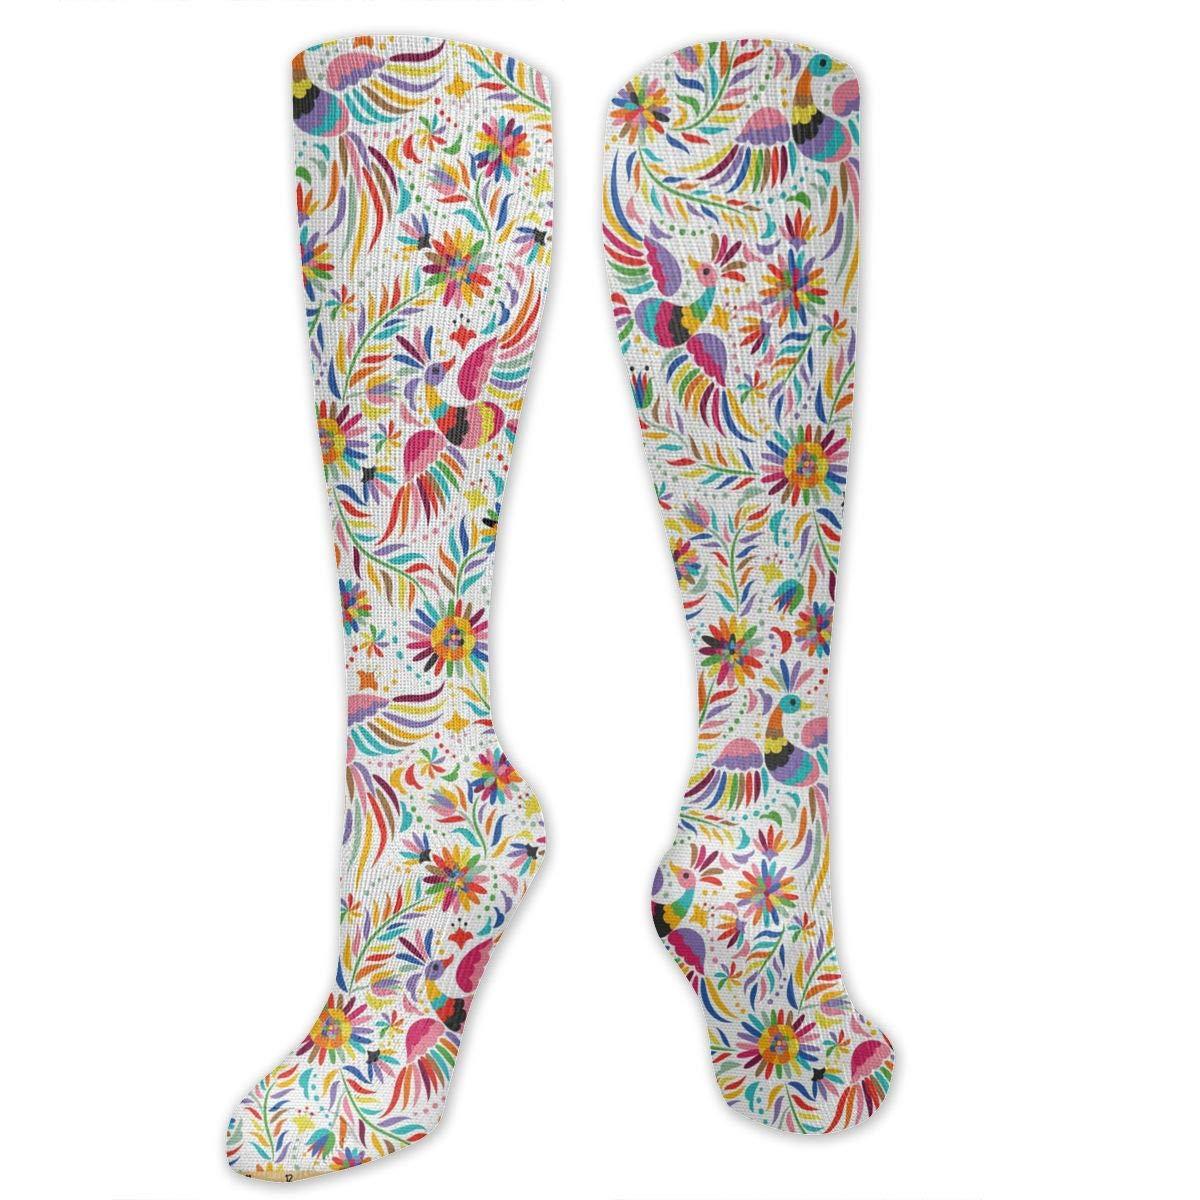 Men Multicolored Pattern Fashionable Fun Crew Cotton Socks Chanwazibibiliu Colorful Nature Inspired Ethnic Mens Colorful Dress Socks Funky